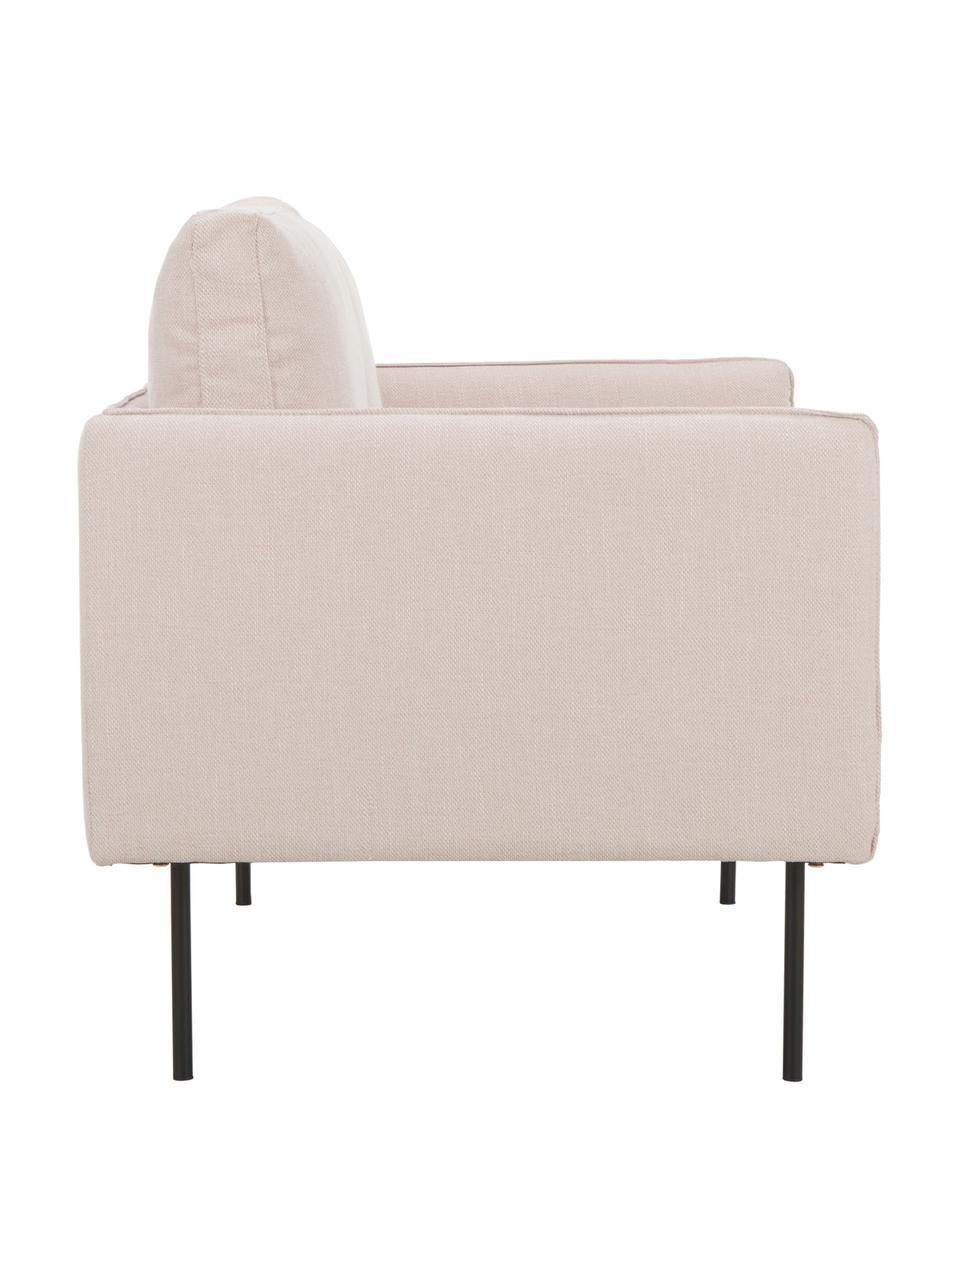 Sofa Ramira (2-Sitzer) in Rosa mit Metall-Füßen, Bezug: Polyester 40.000 Scheuert, Gestell: Massives Kiefernholz, Spe, Füße: Metall, pulverbeschichtet, Webstoff Rosa, 151 x 79 cm